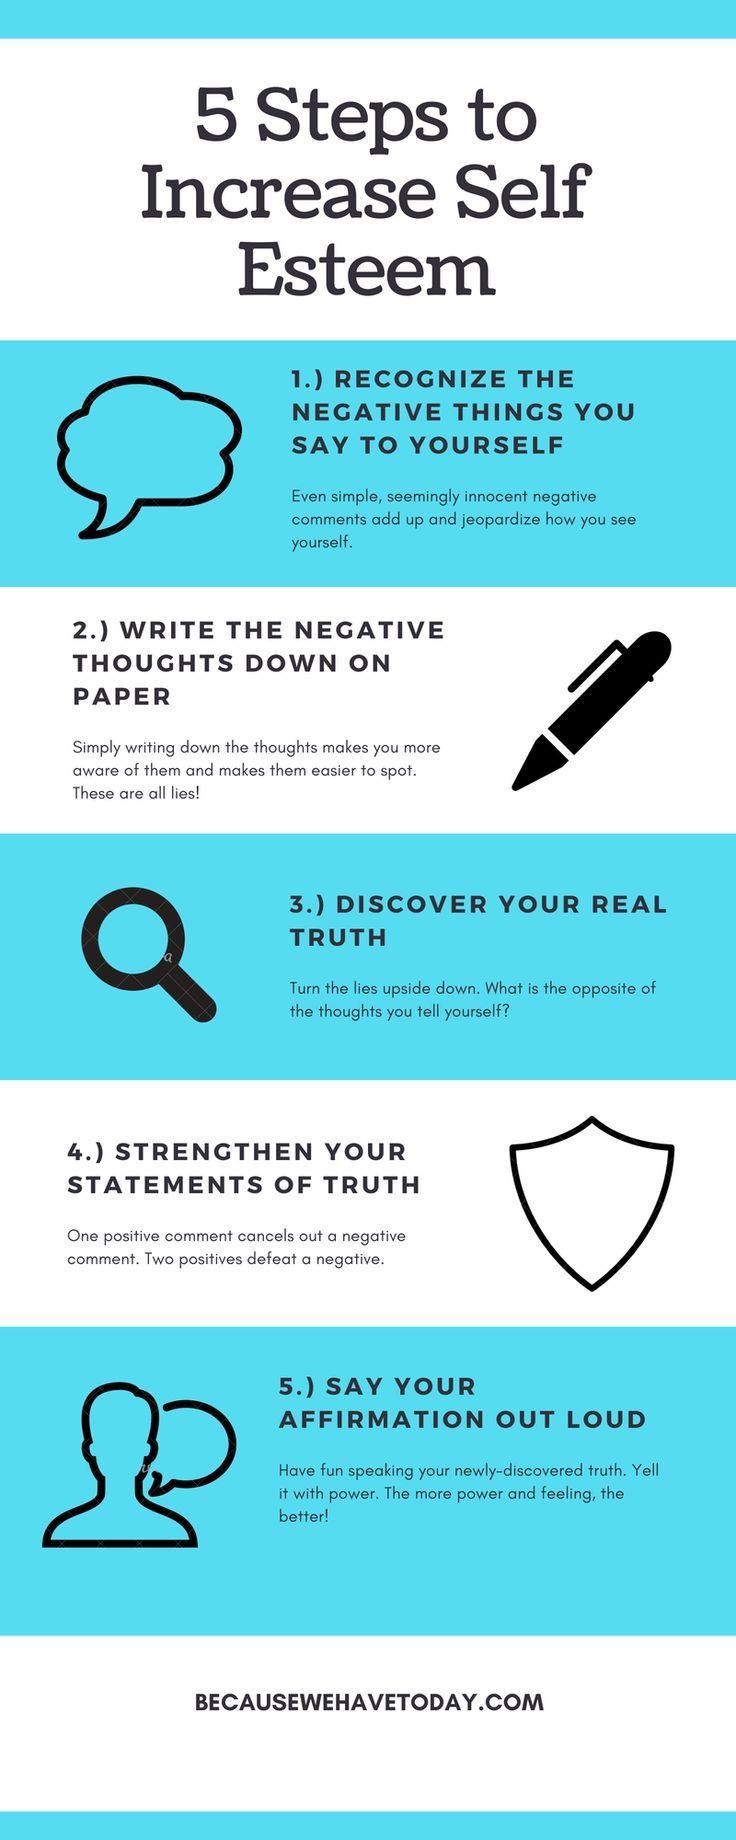 5 Steps To Increase Self Esteem Why Positive Affirmations Are Powerful Self Esteem Quotes Self Esteem Activities Self Esteem Worksheets